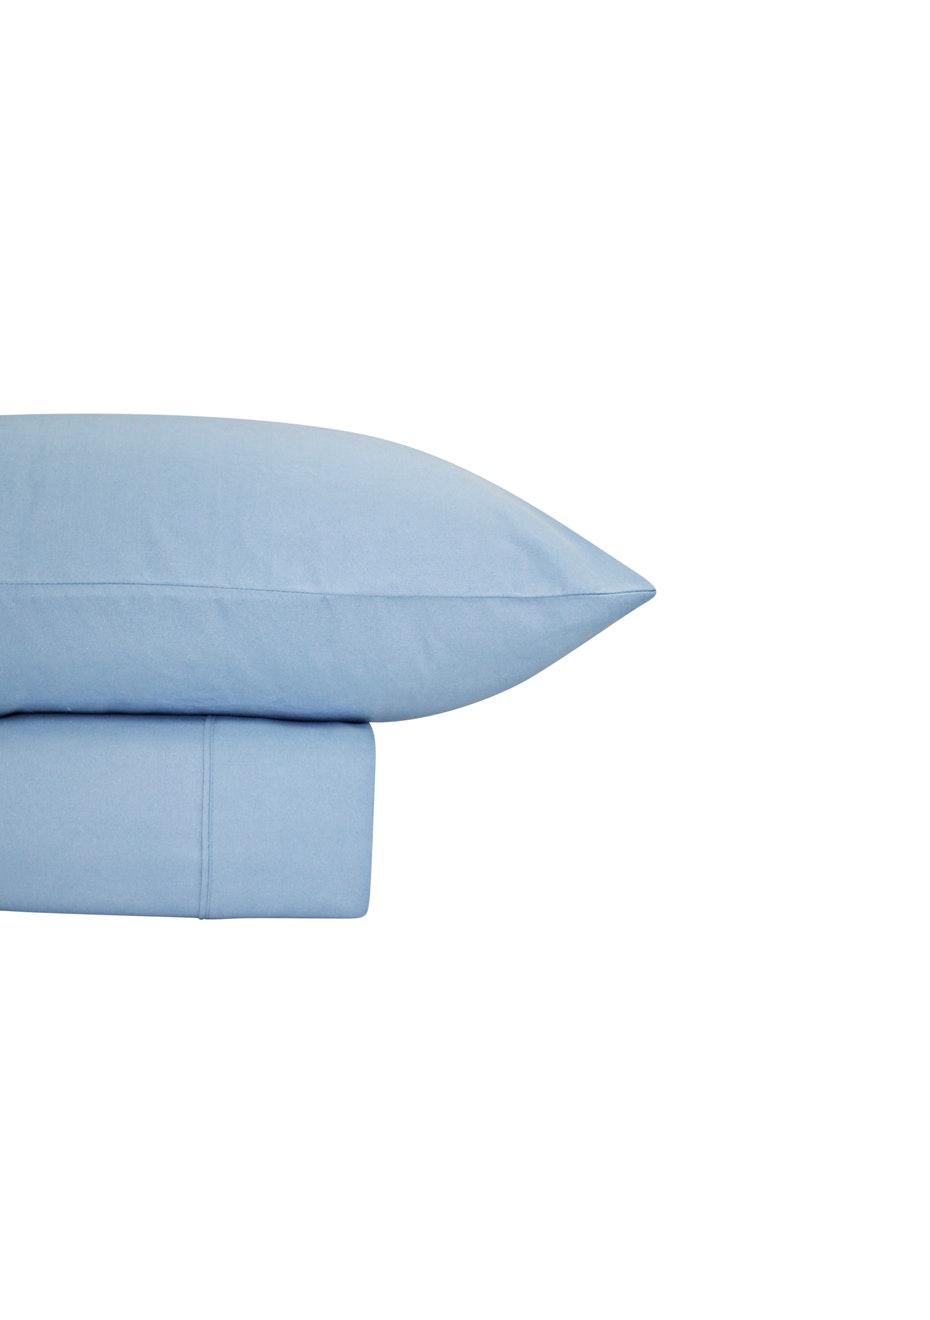 Thermal Flannel Sheet Sets - Bay Blue - King Bed